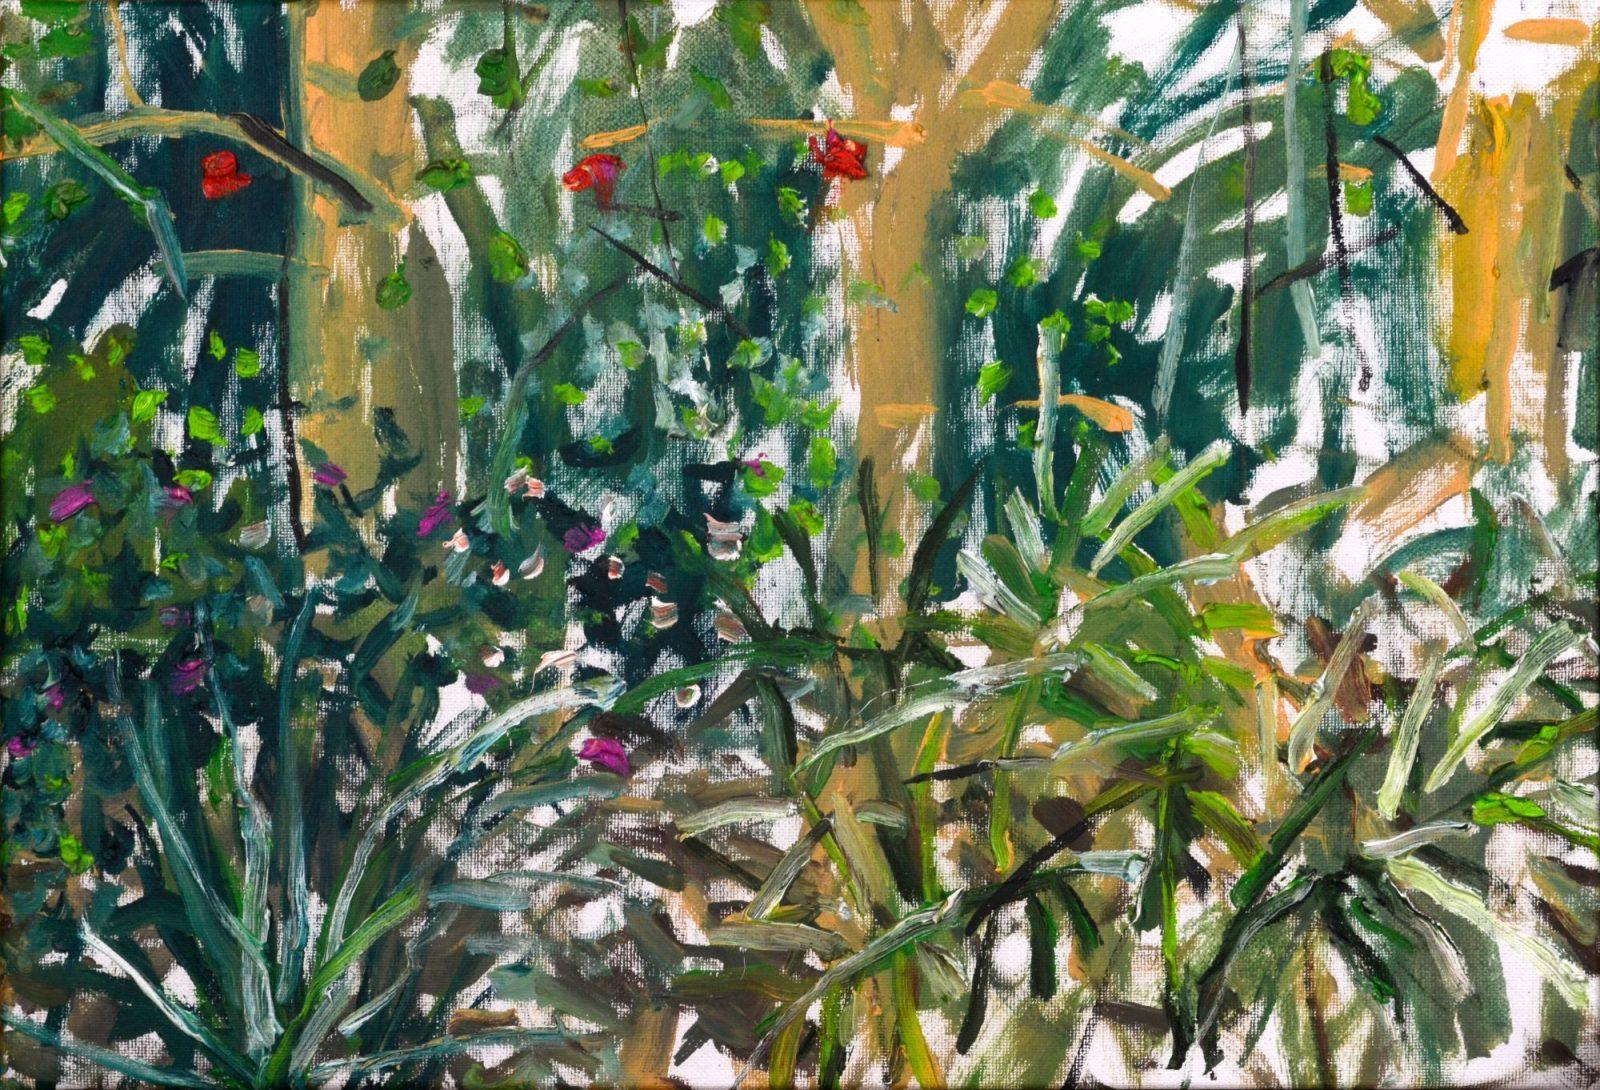 franyo aatoth: Garden Series 30.